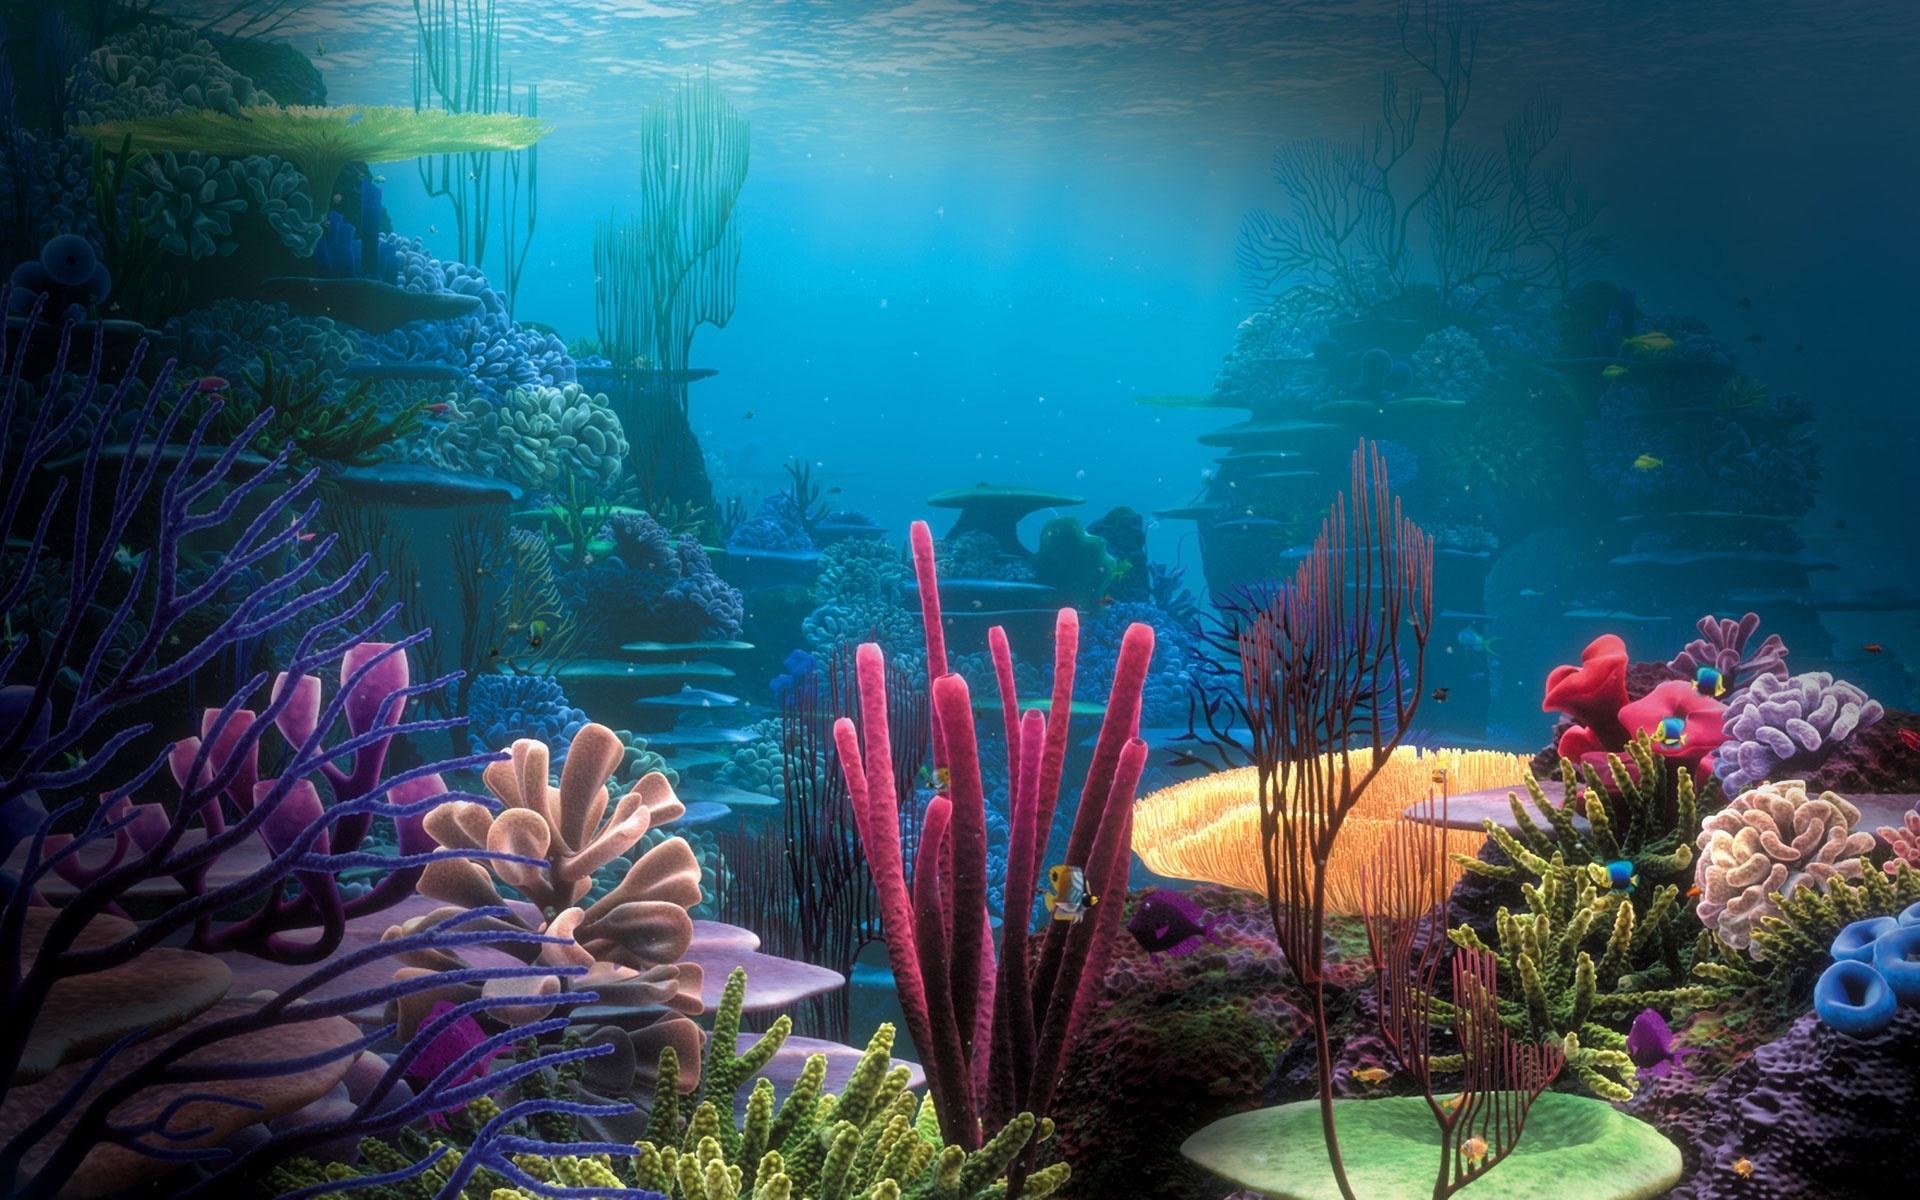 fish tank backgrounds hd wallpaper. - media file | pixelstalk